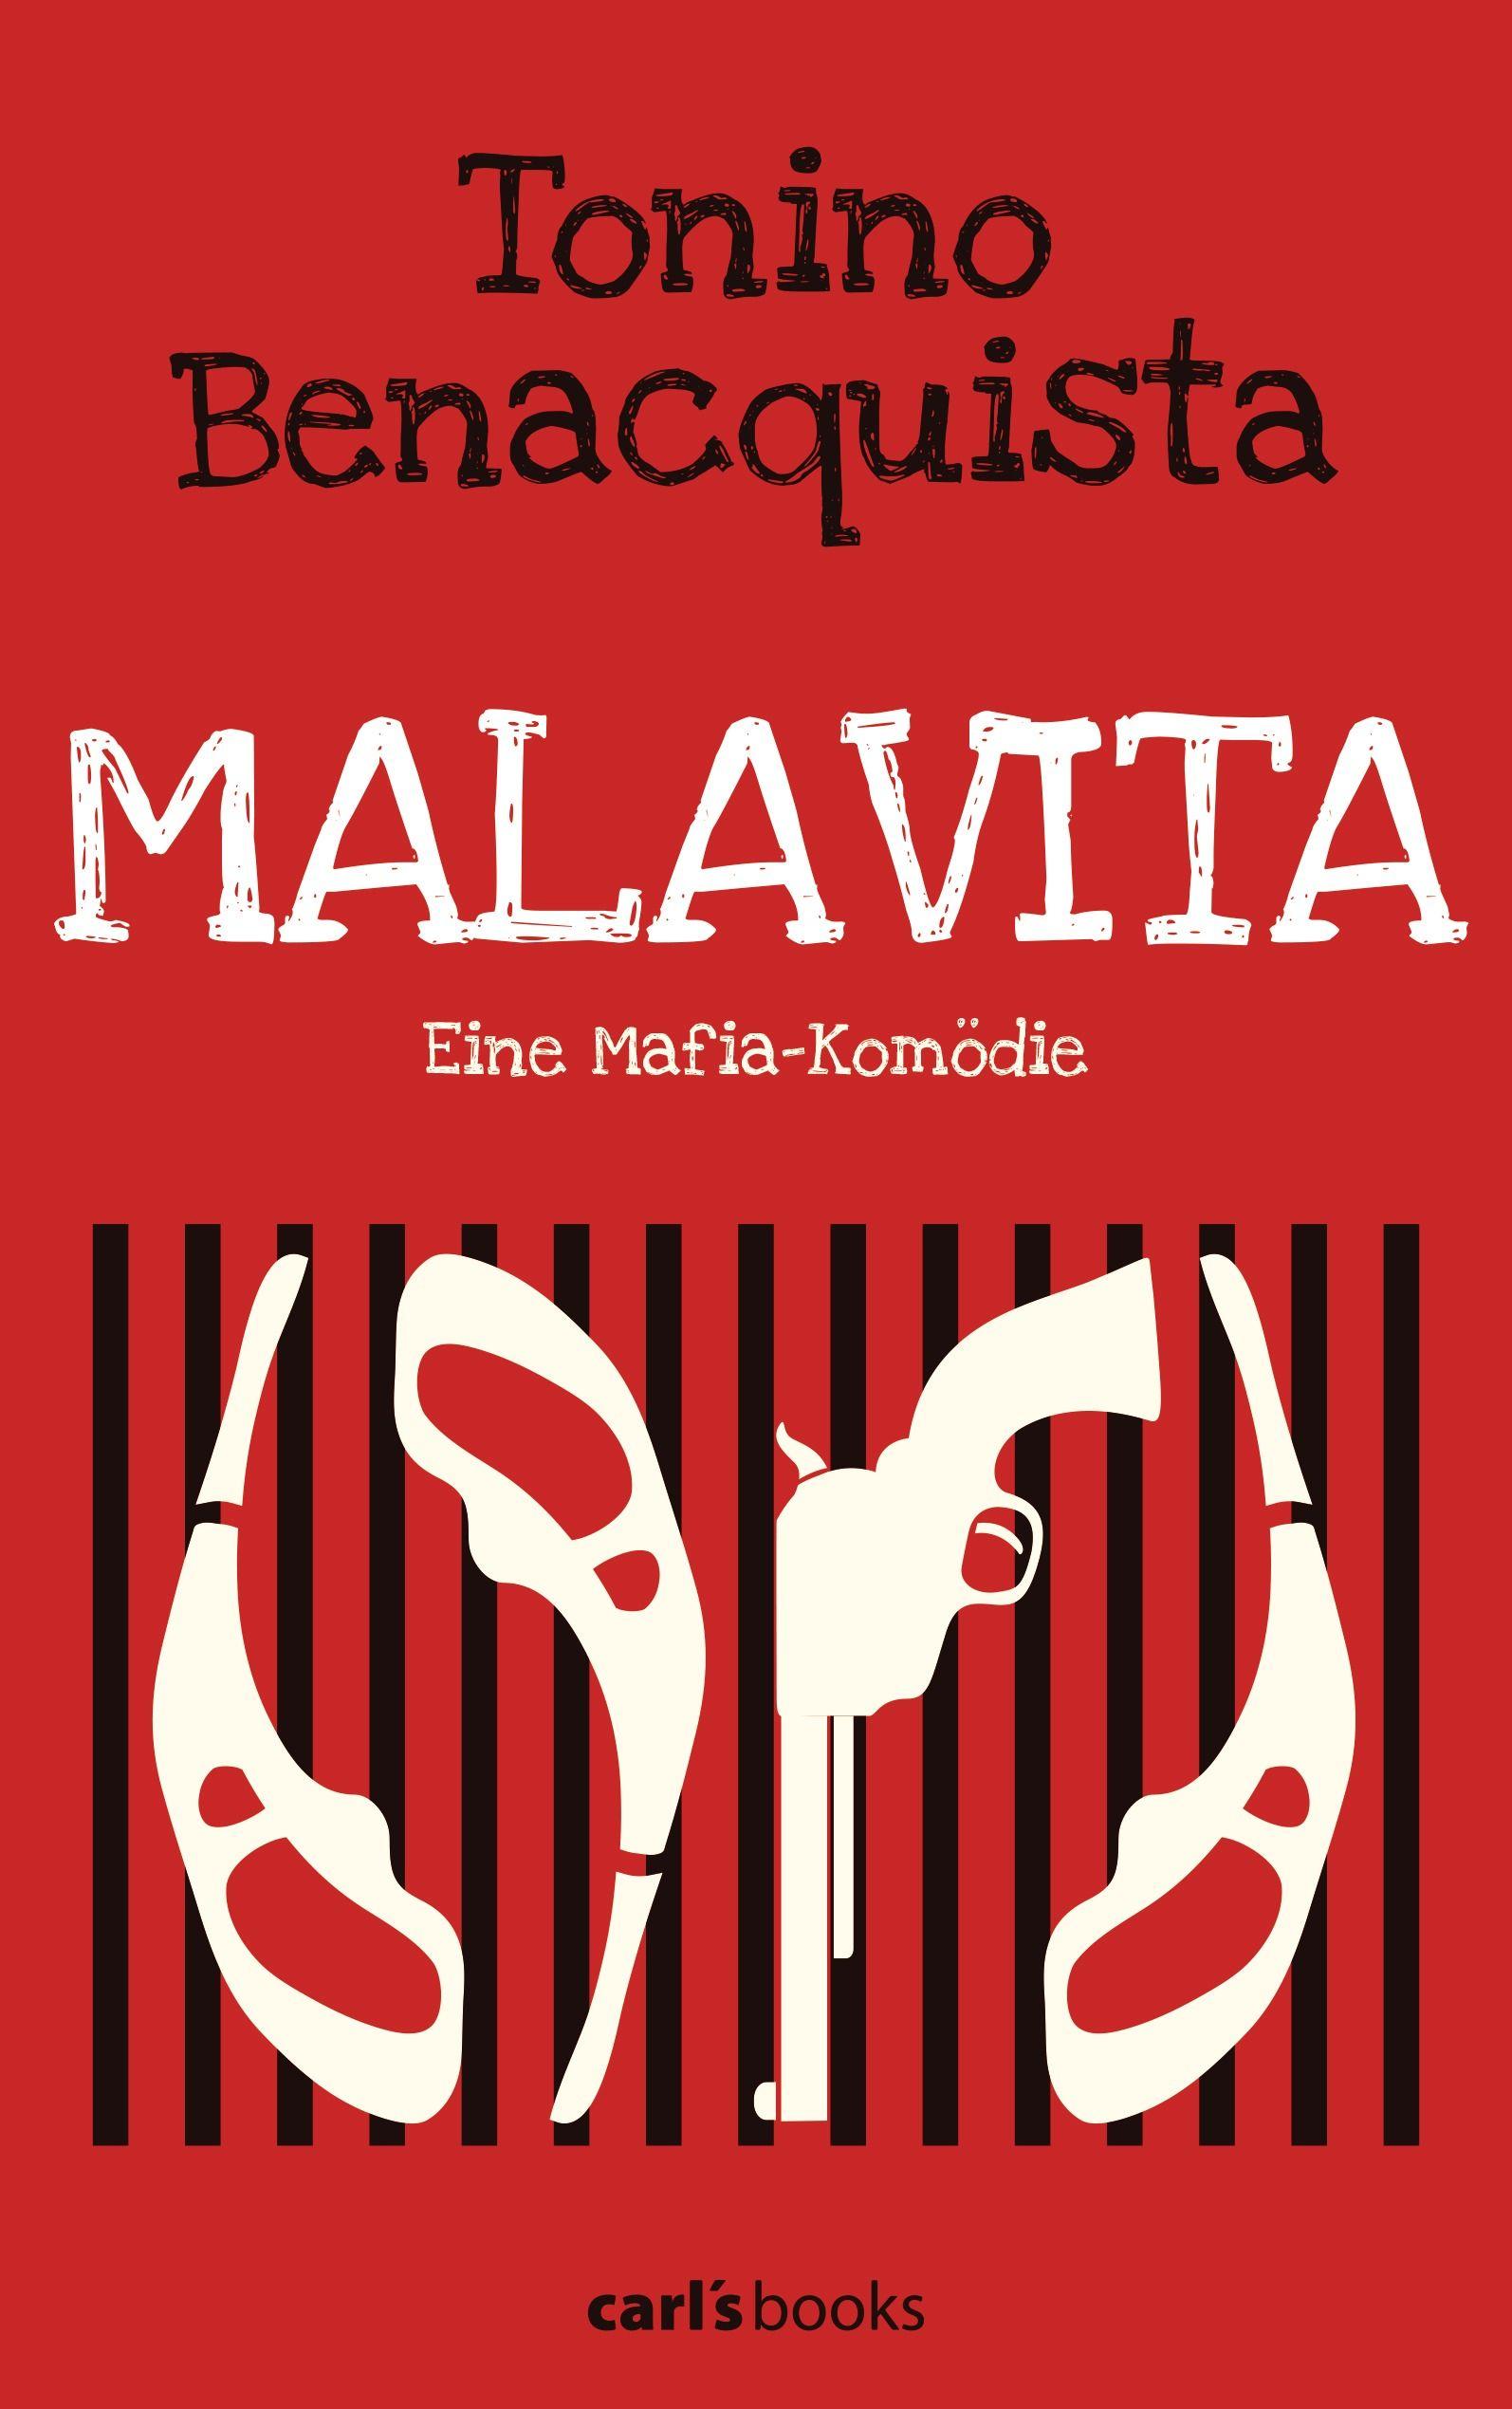 Malavita von Tonino Benacquista